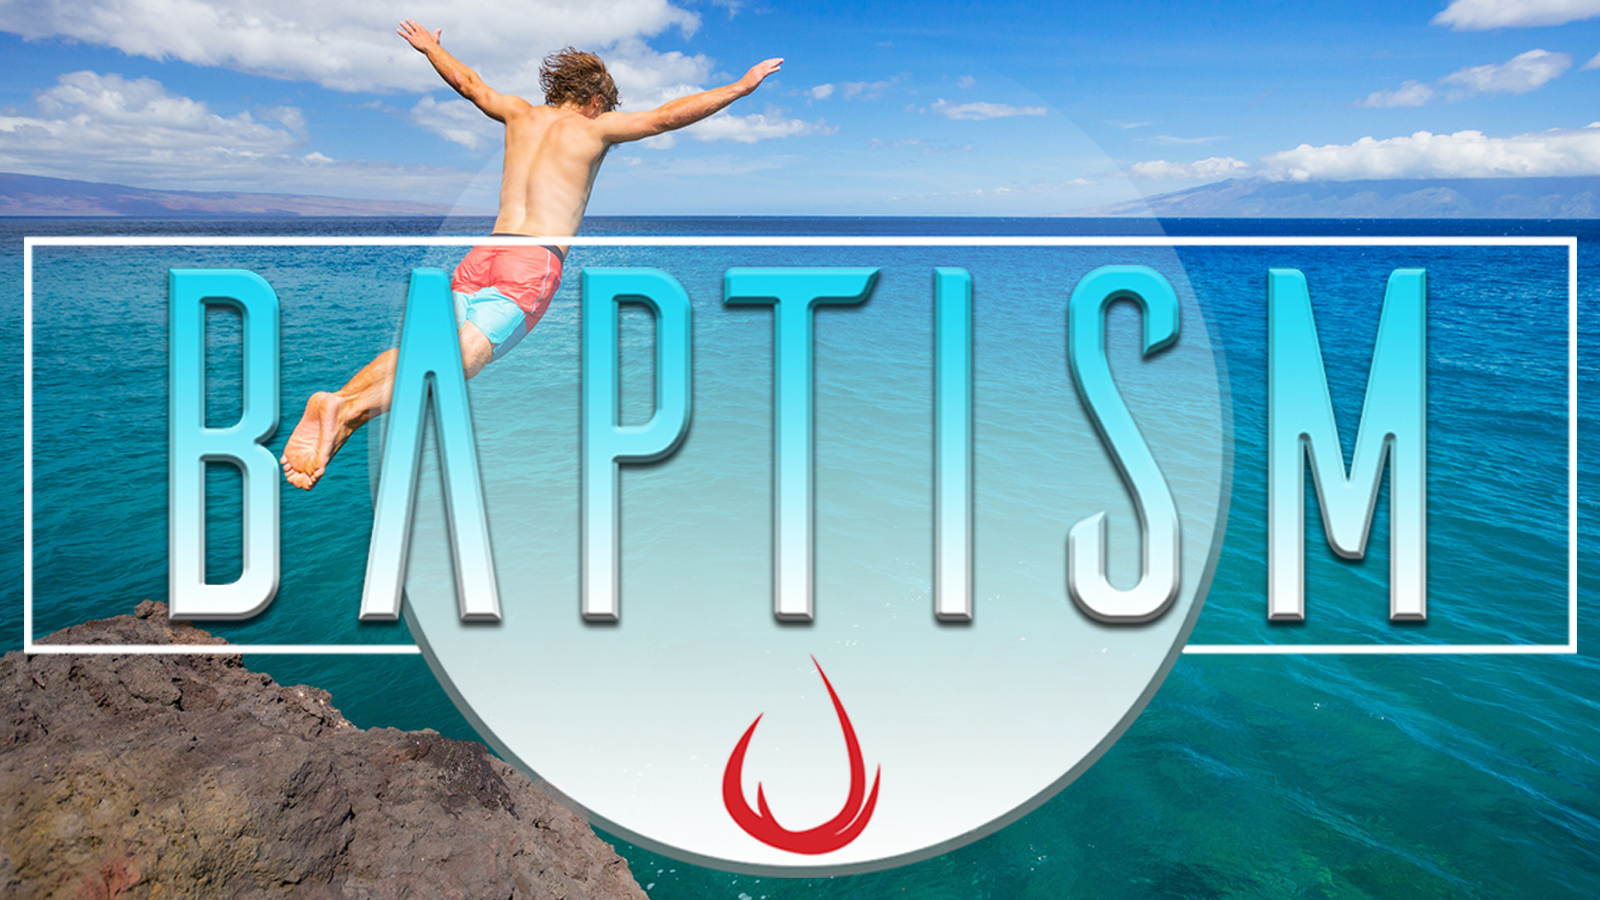 Baptism (Standard Wide 1600x900)